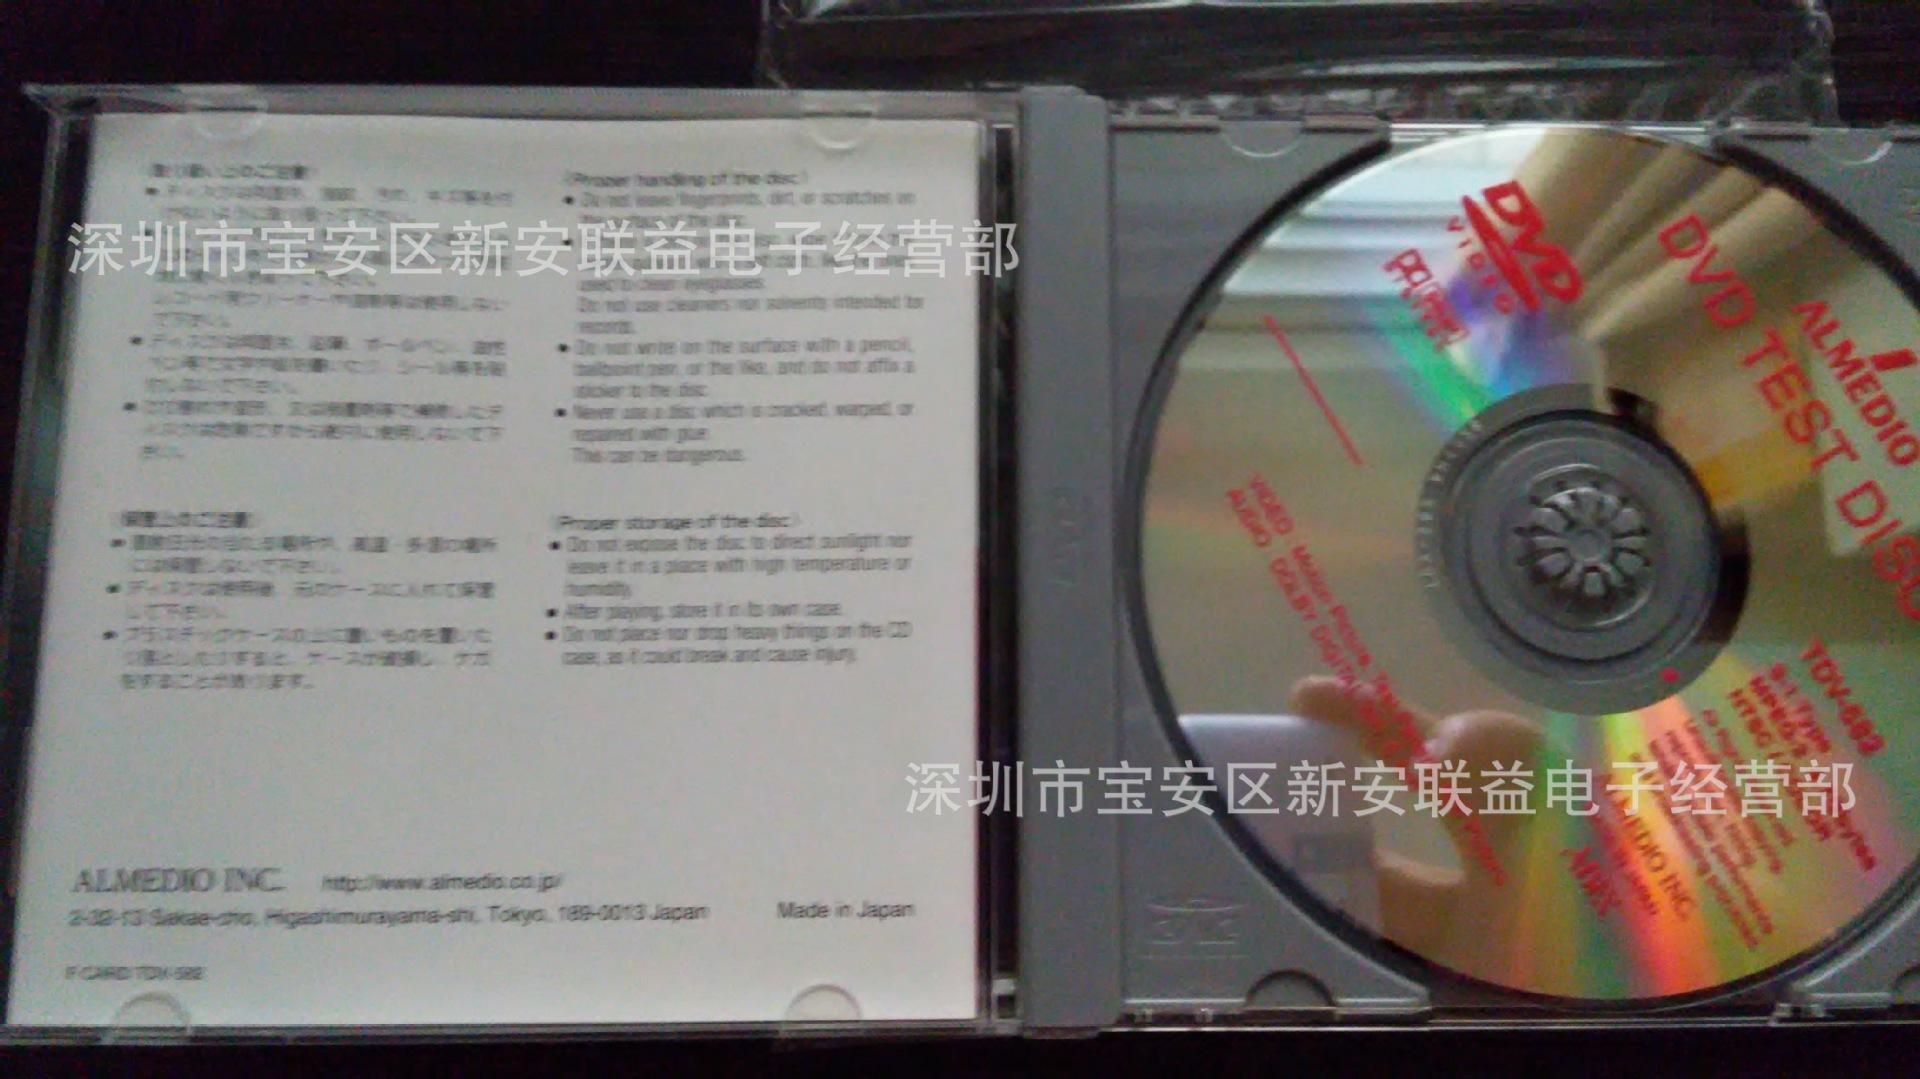 ABEX测试碟  TDV-520C DVD标准信号测试碟